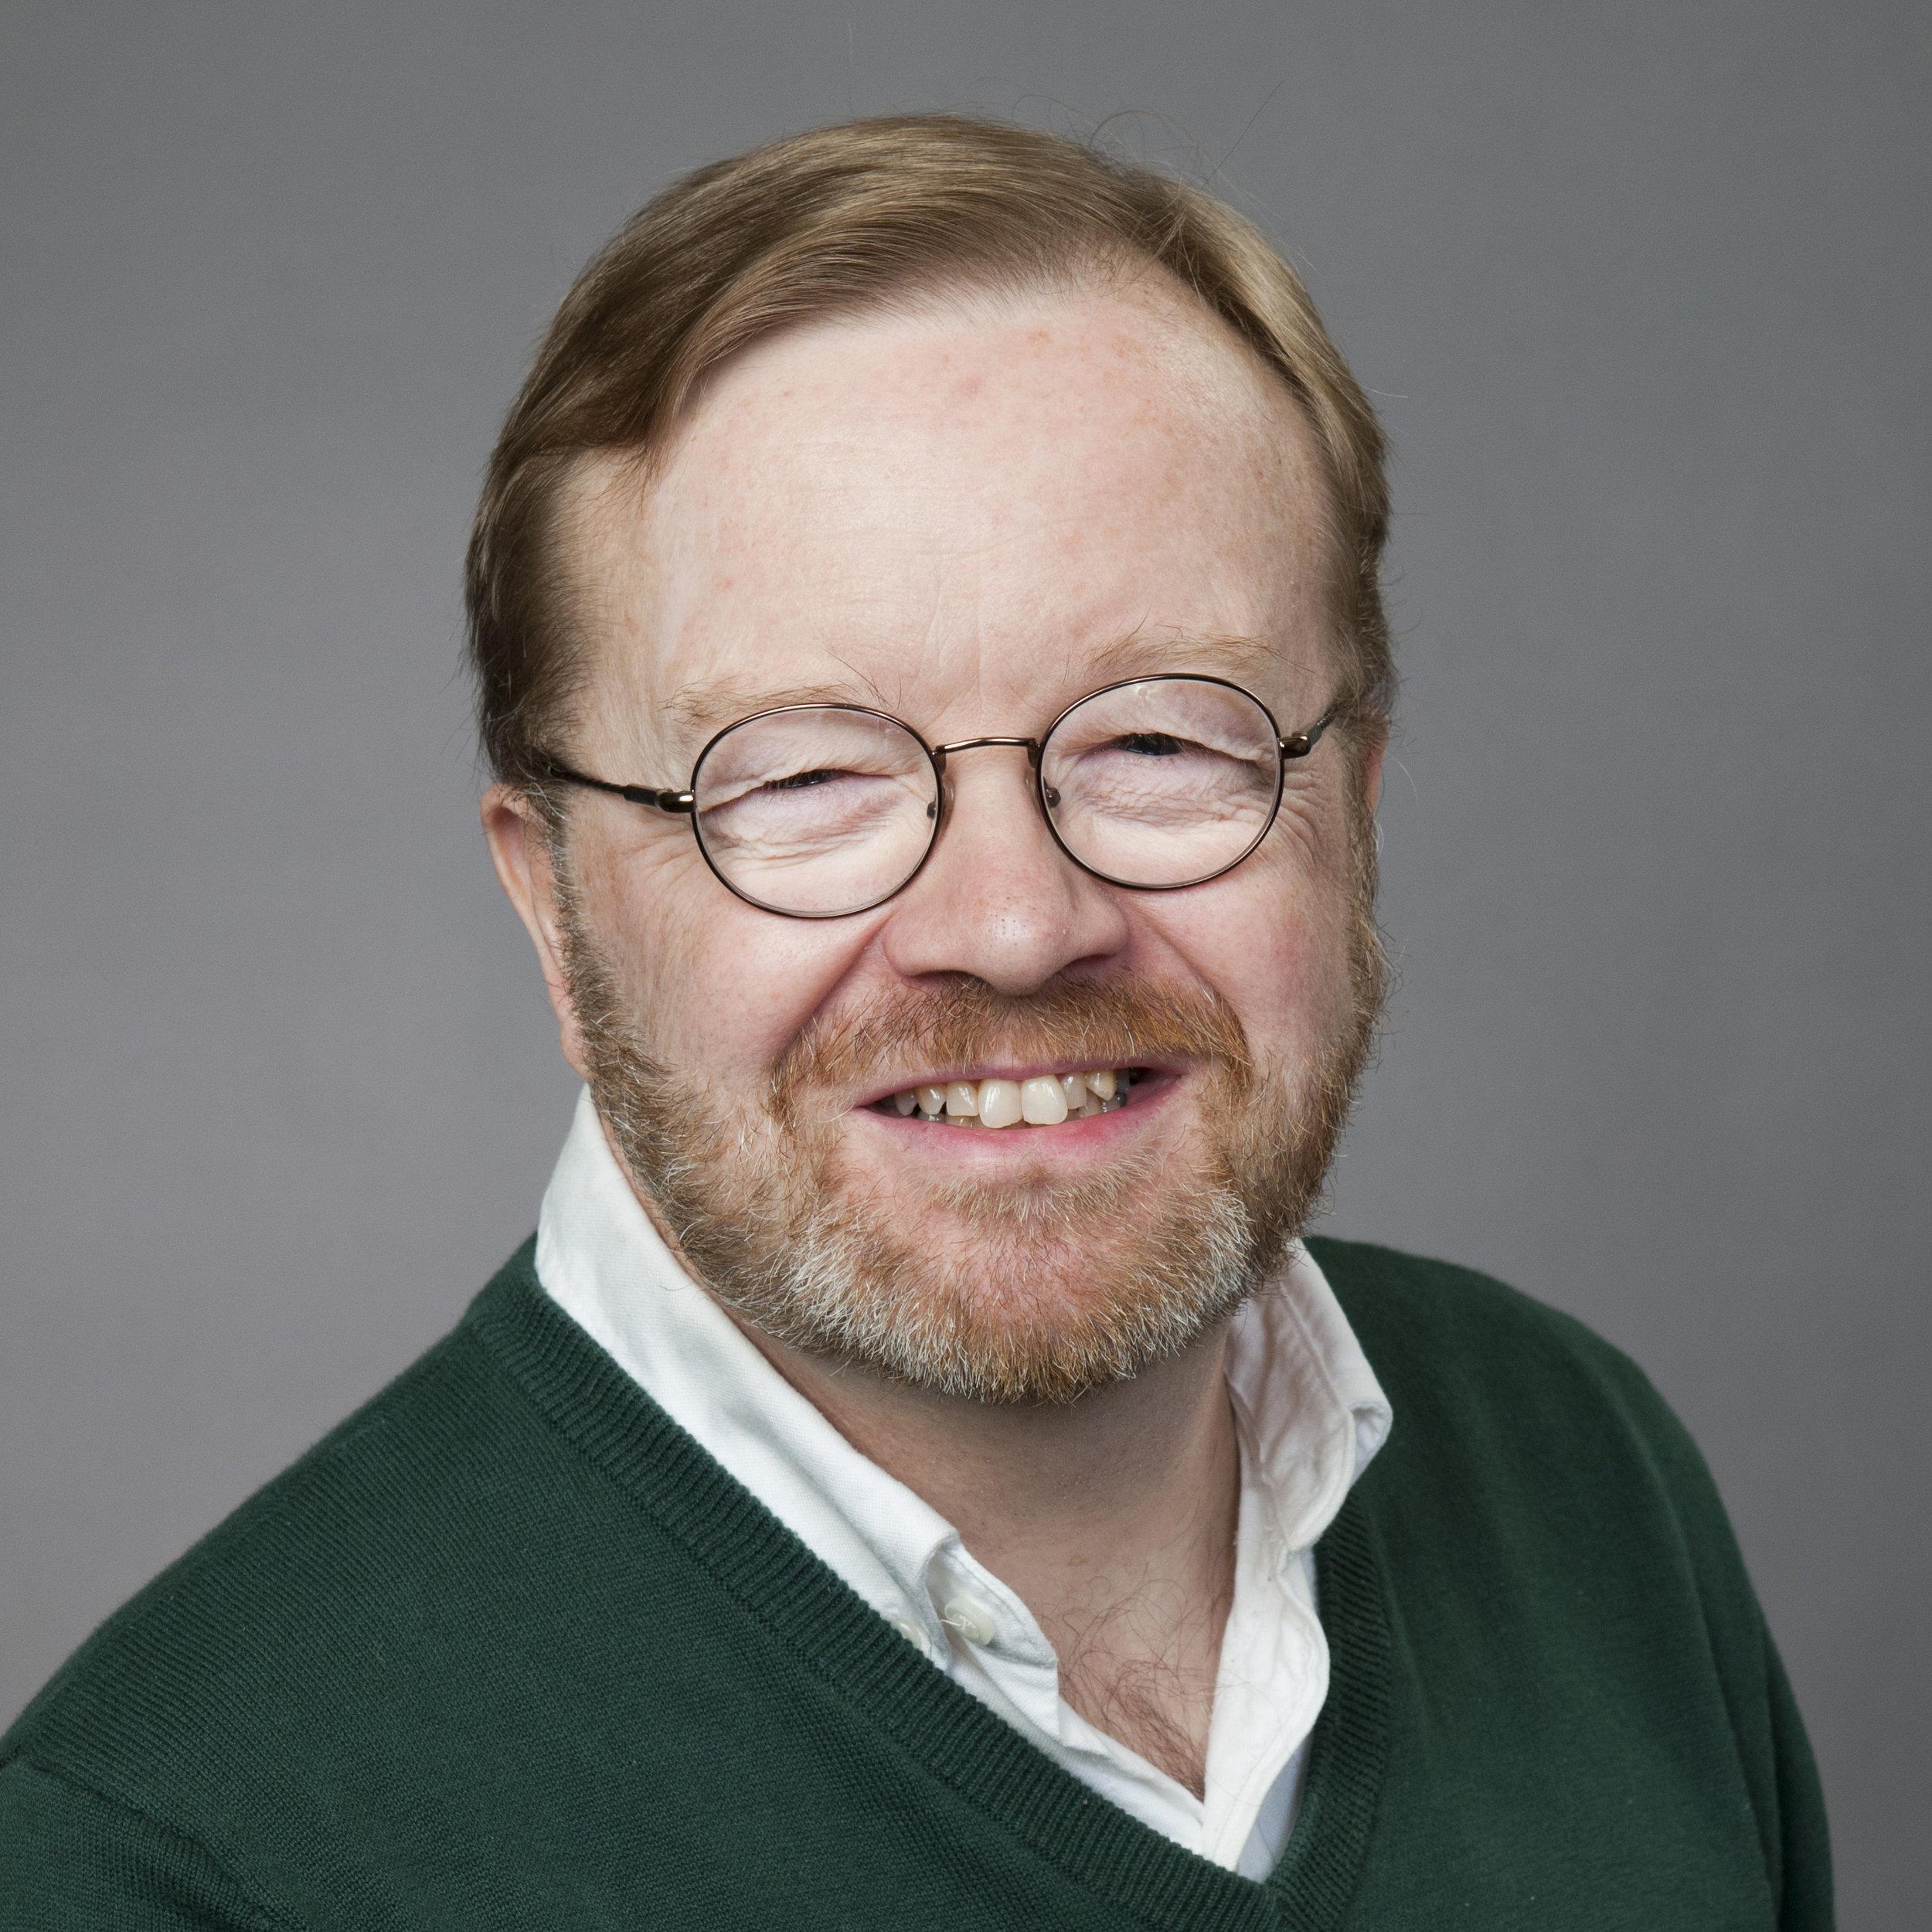 Jim Kollebbrioch